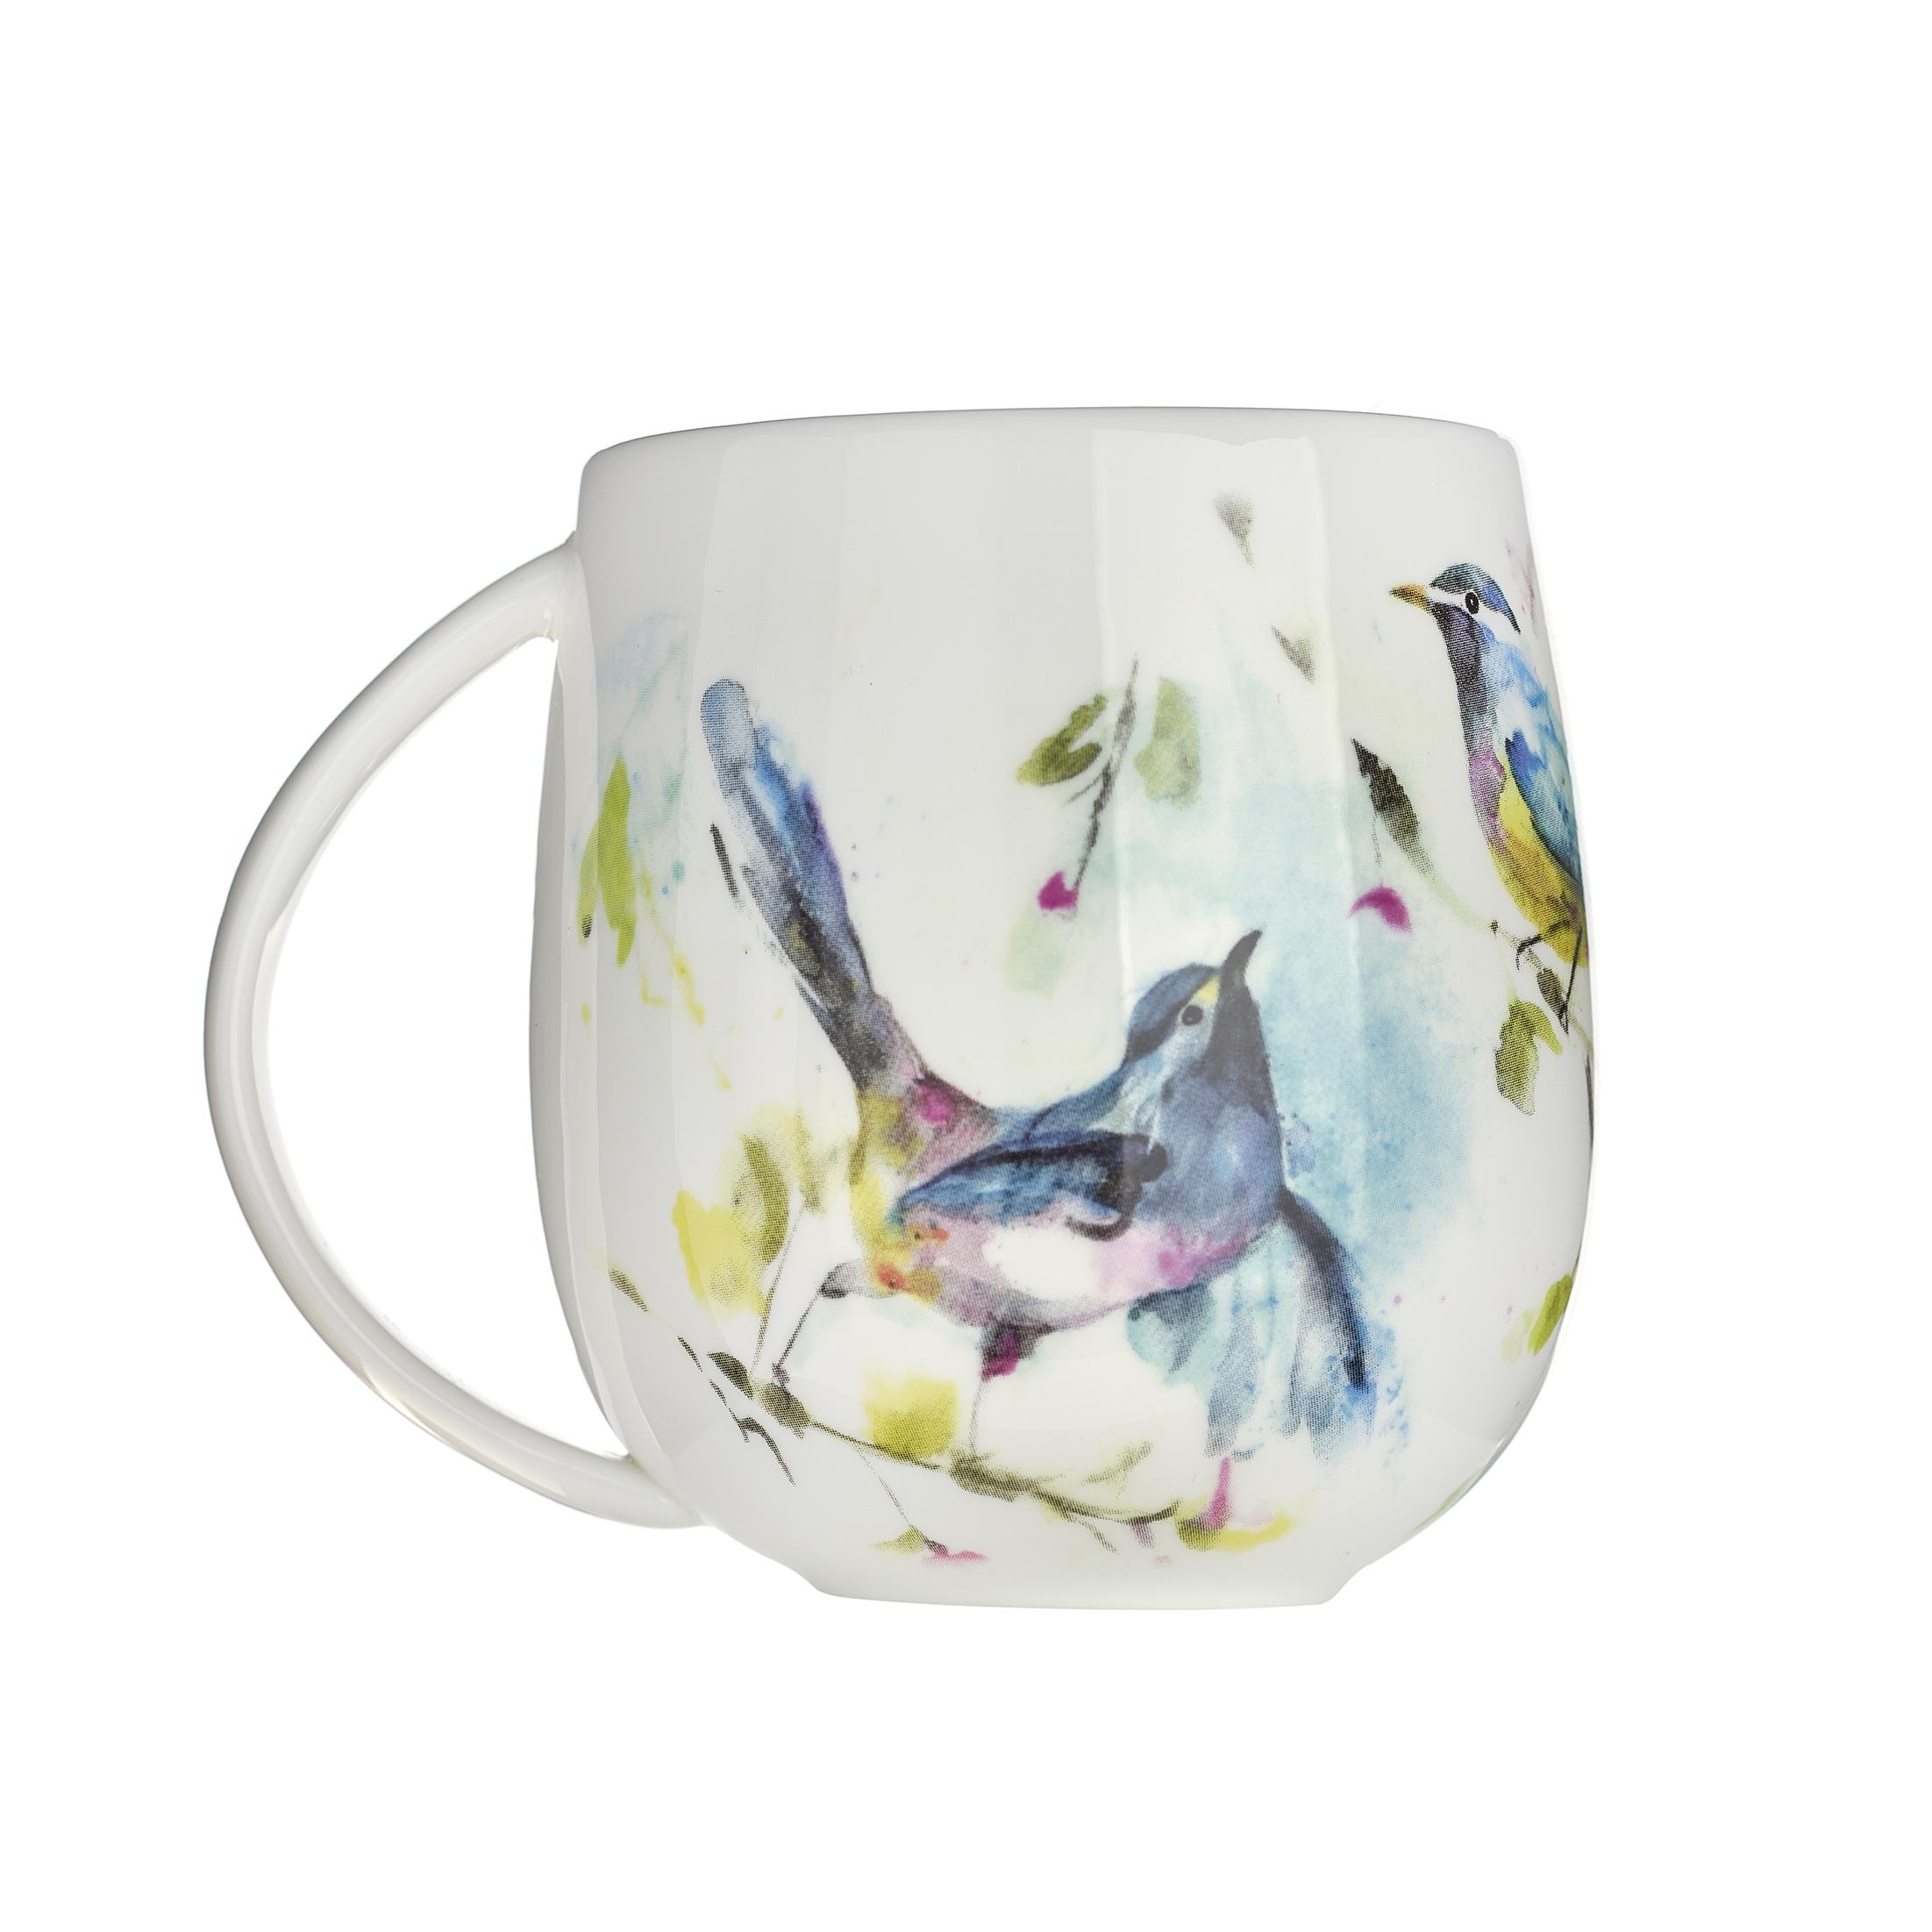 Spring Flight Mug 10(h) x 11.4(w) x 8.2cm(d)